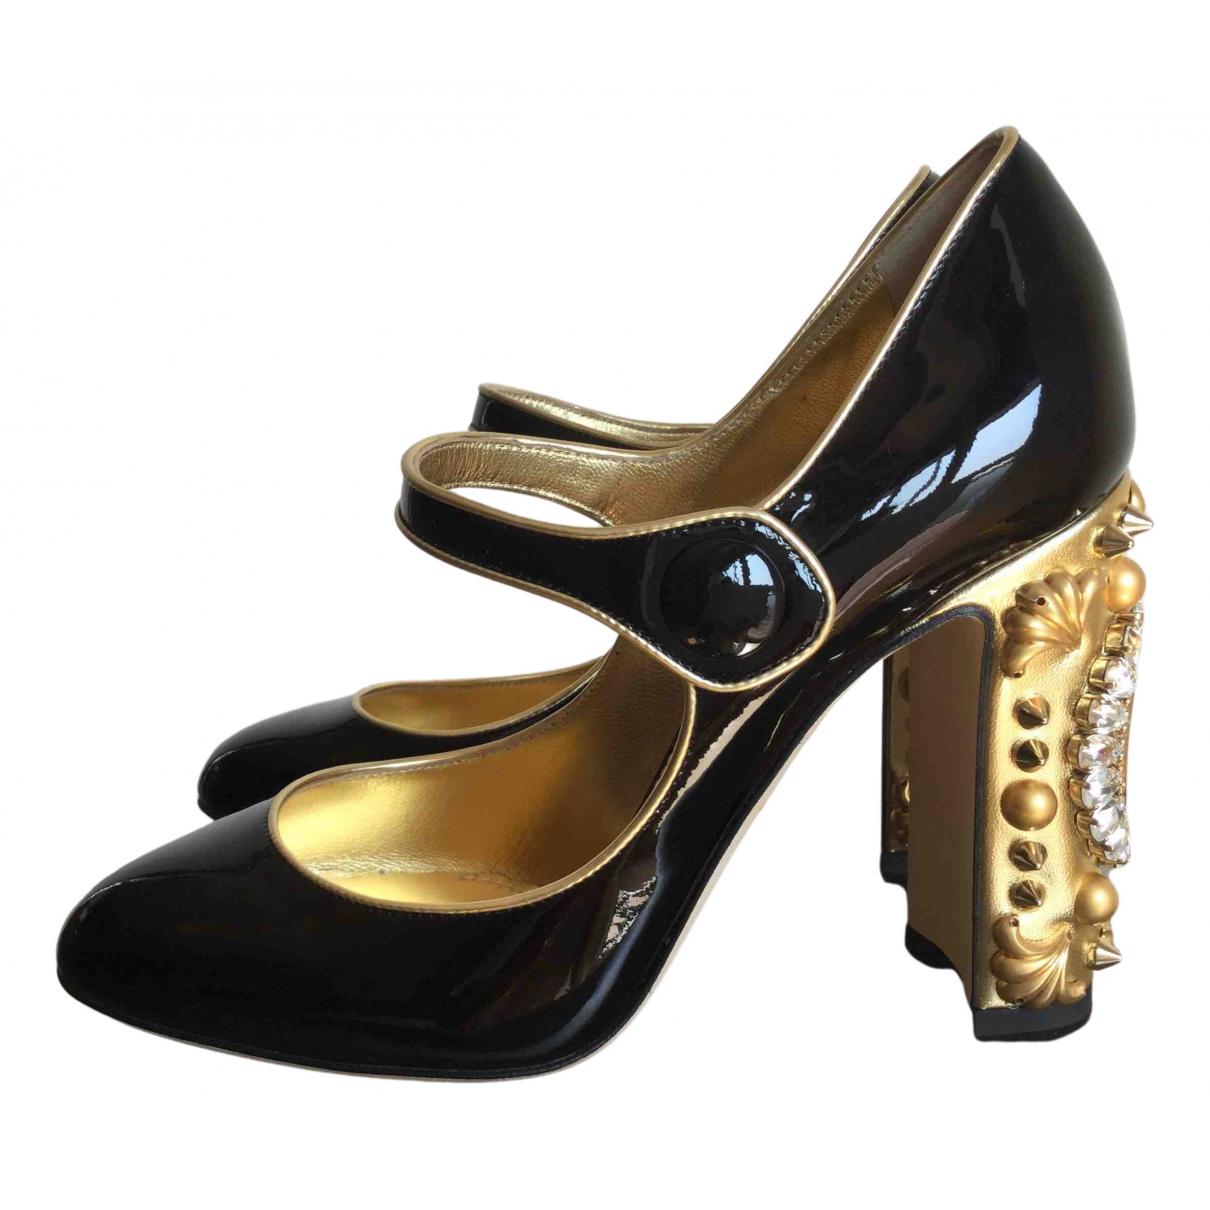 Dolce & Gabbana N Black Leather Heels for Women 37.5 EU